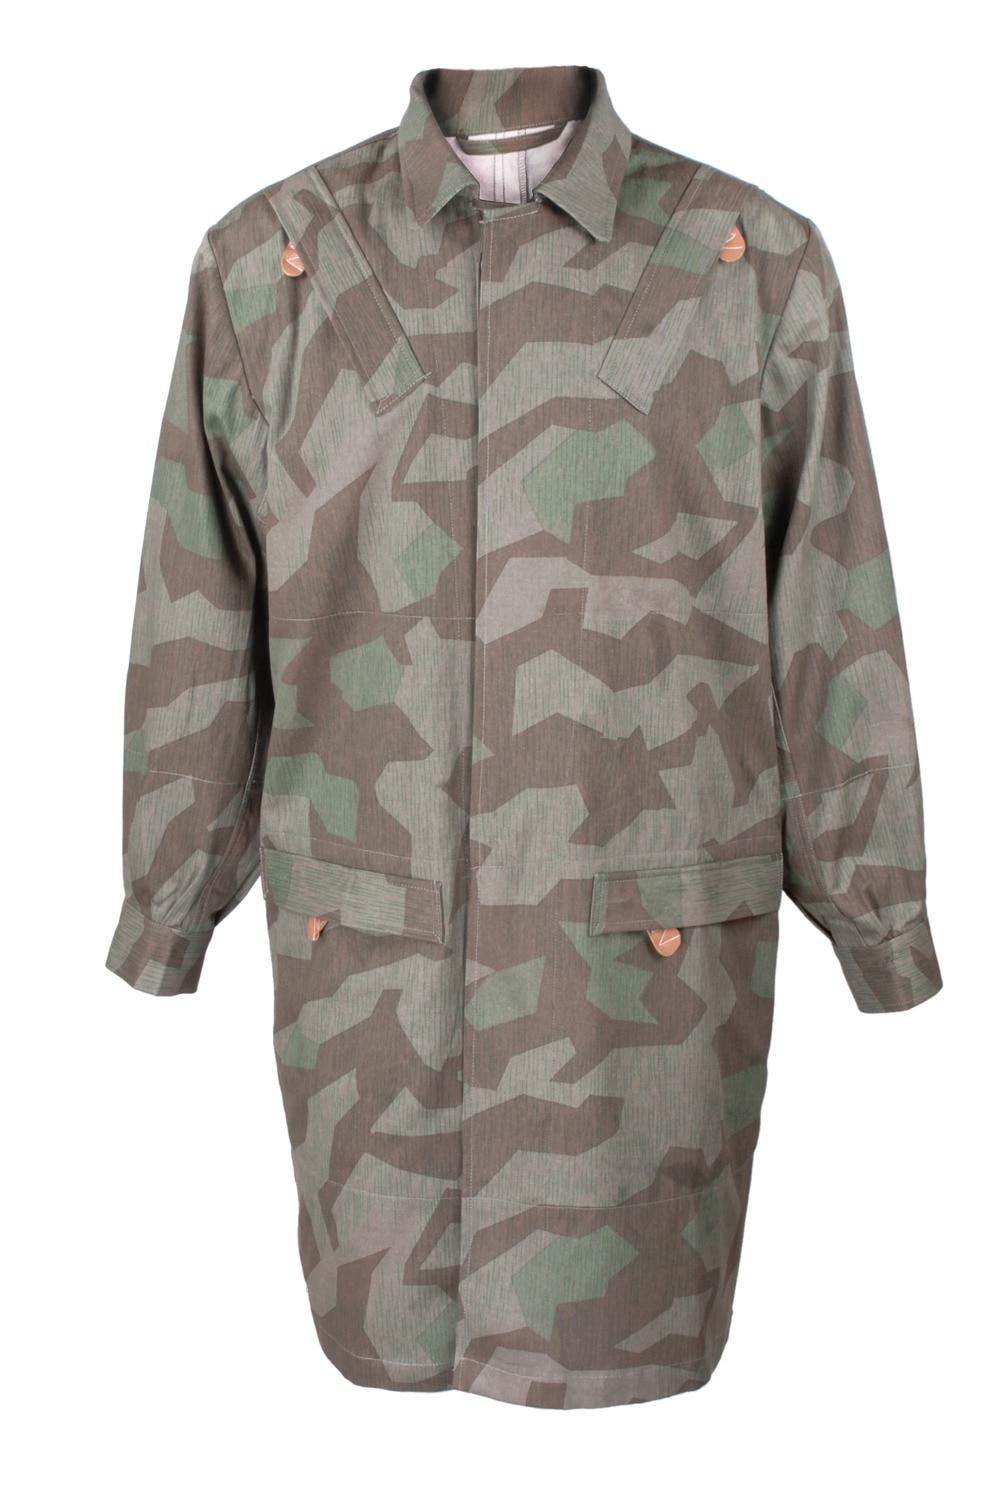 2018 AFS JEEP Jacket Big Size 7XL 8XL Autumn Jacket Men Cotton Stand Collar Multi pockets